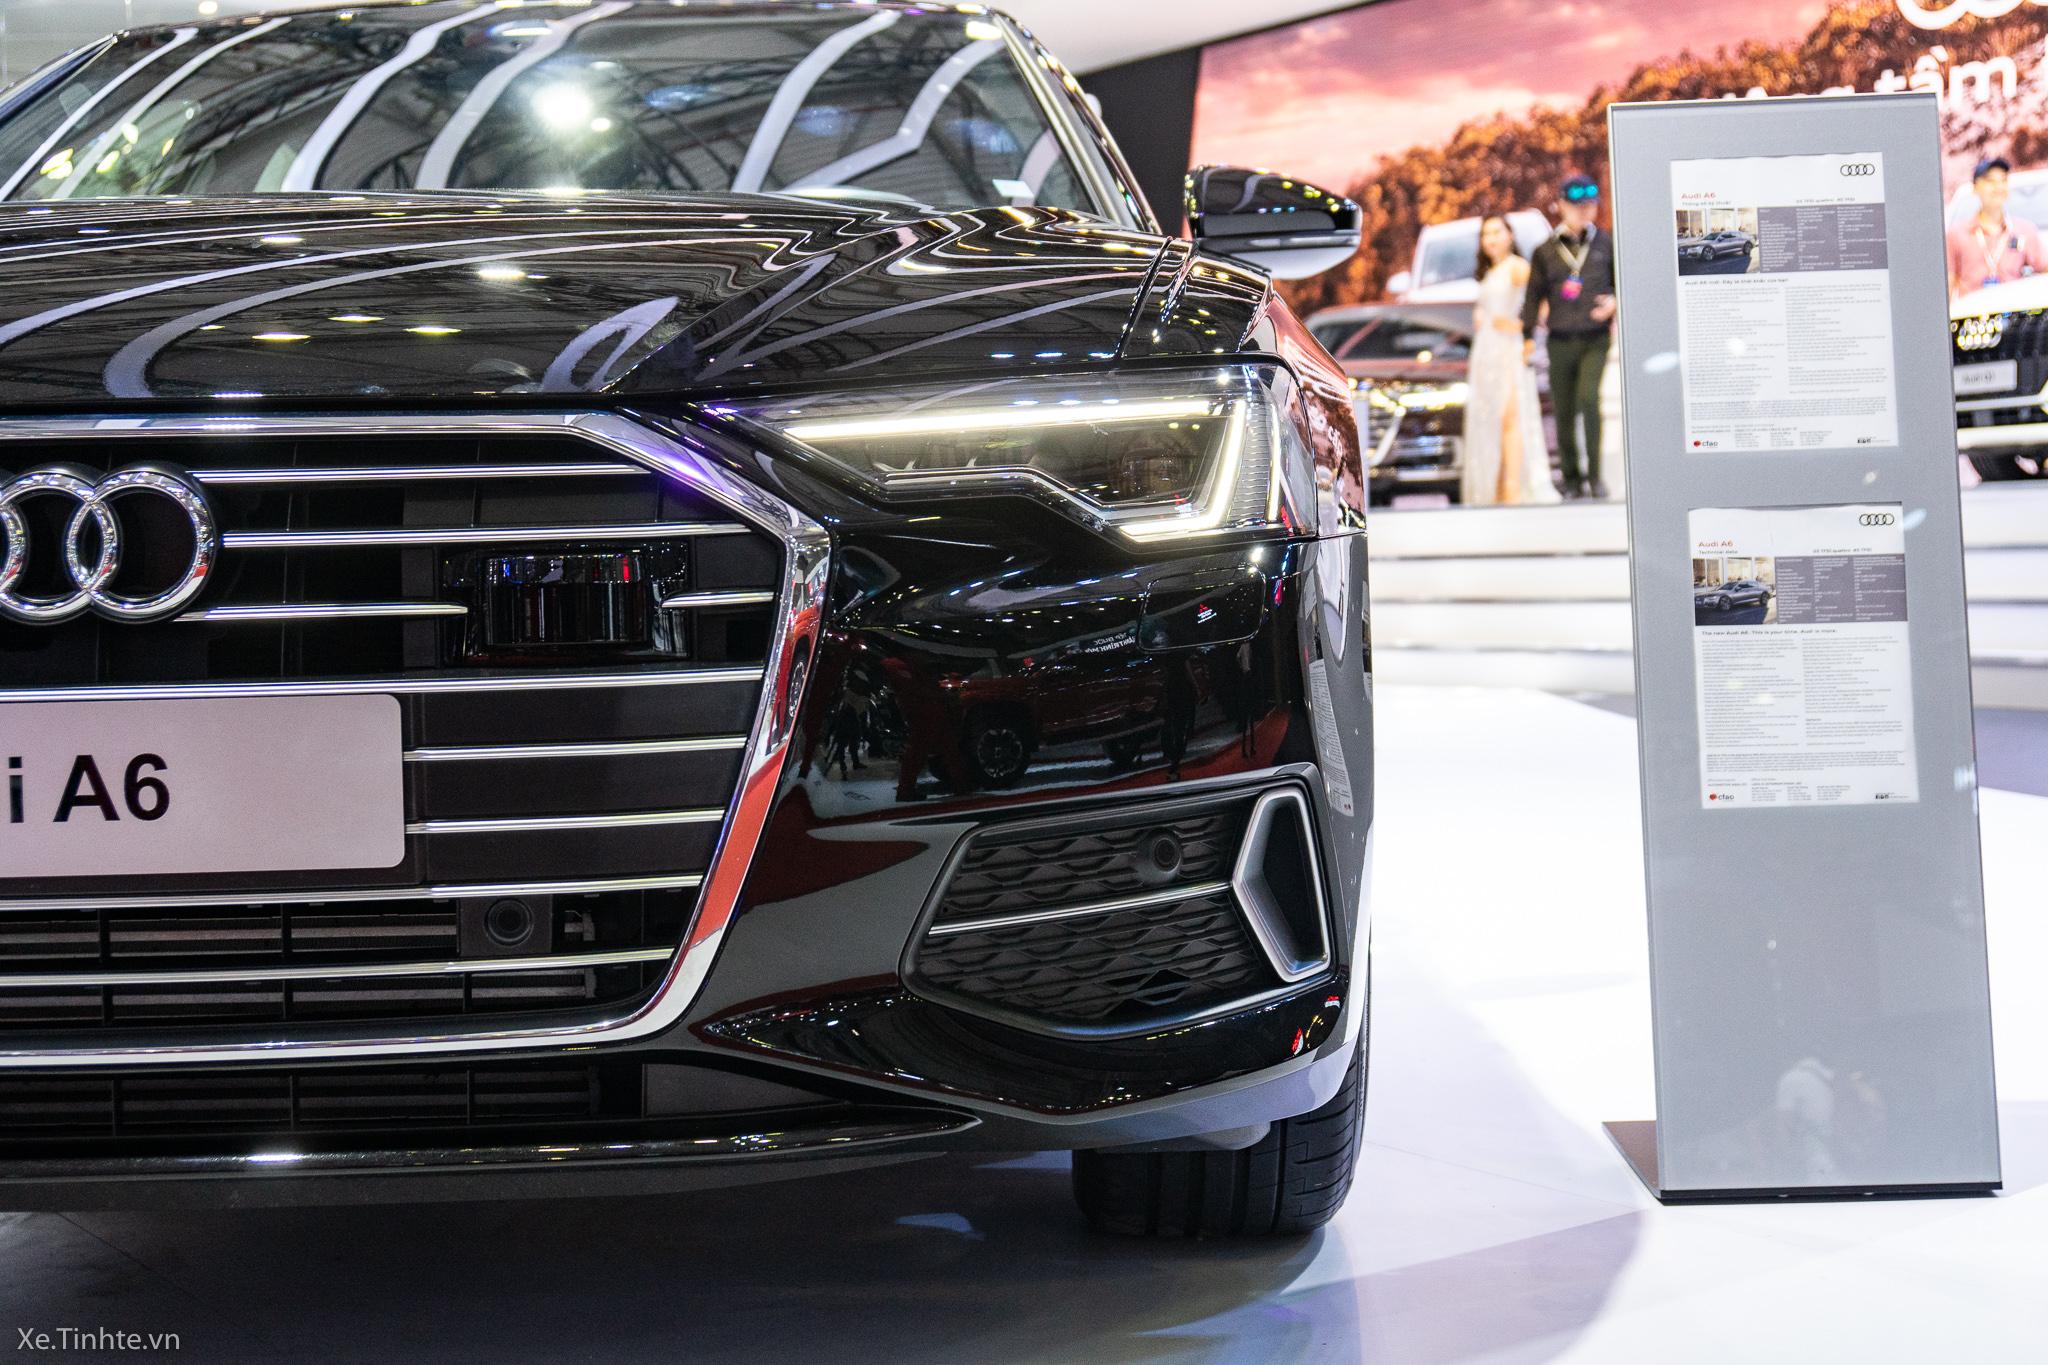 VMS19_Audi_A6-05826.jpg